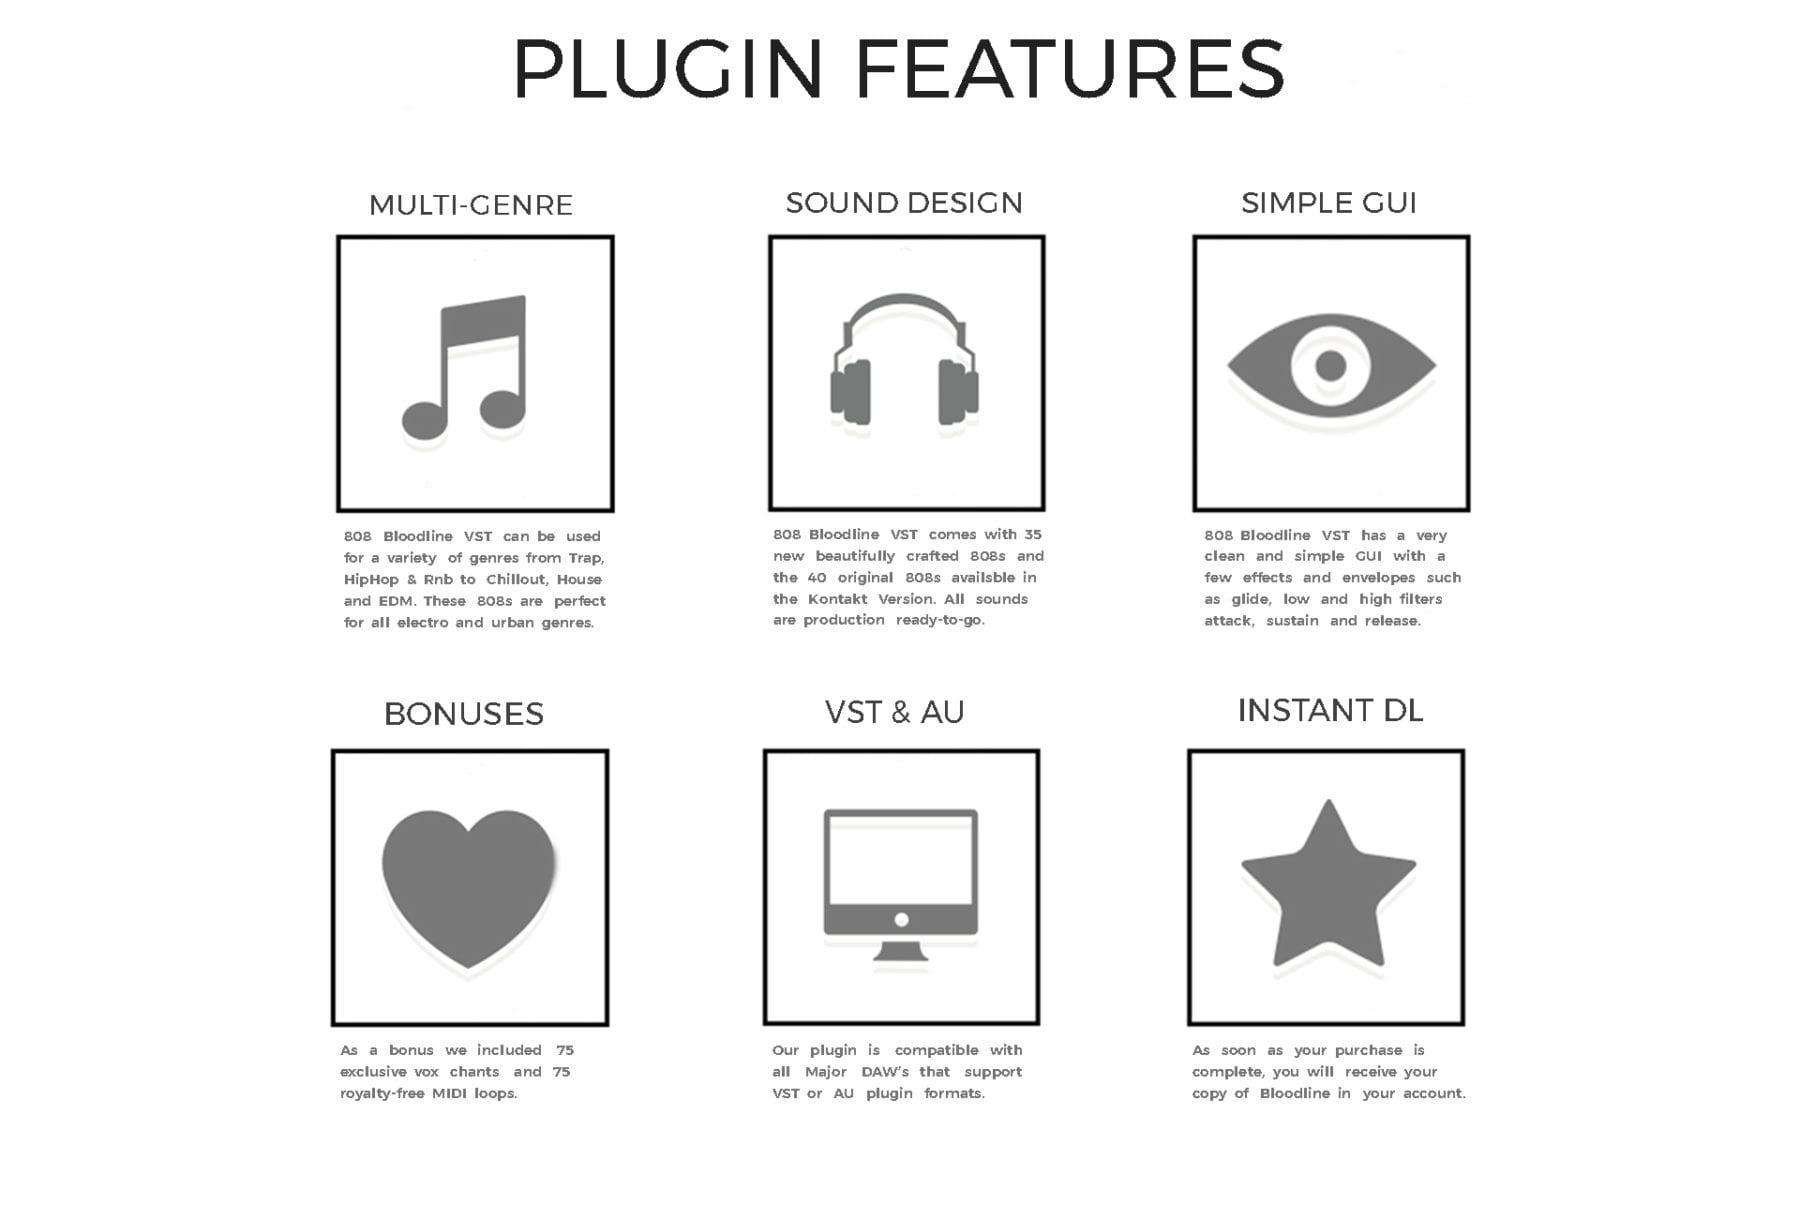 Features For 808 VST Plugin - Bloodline